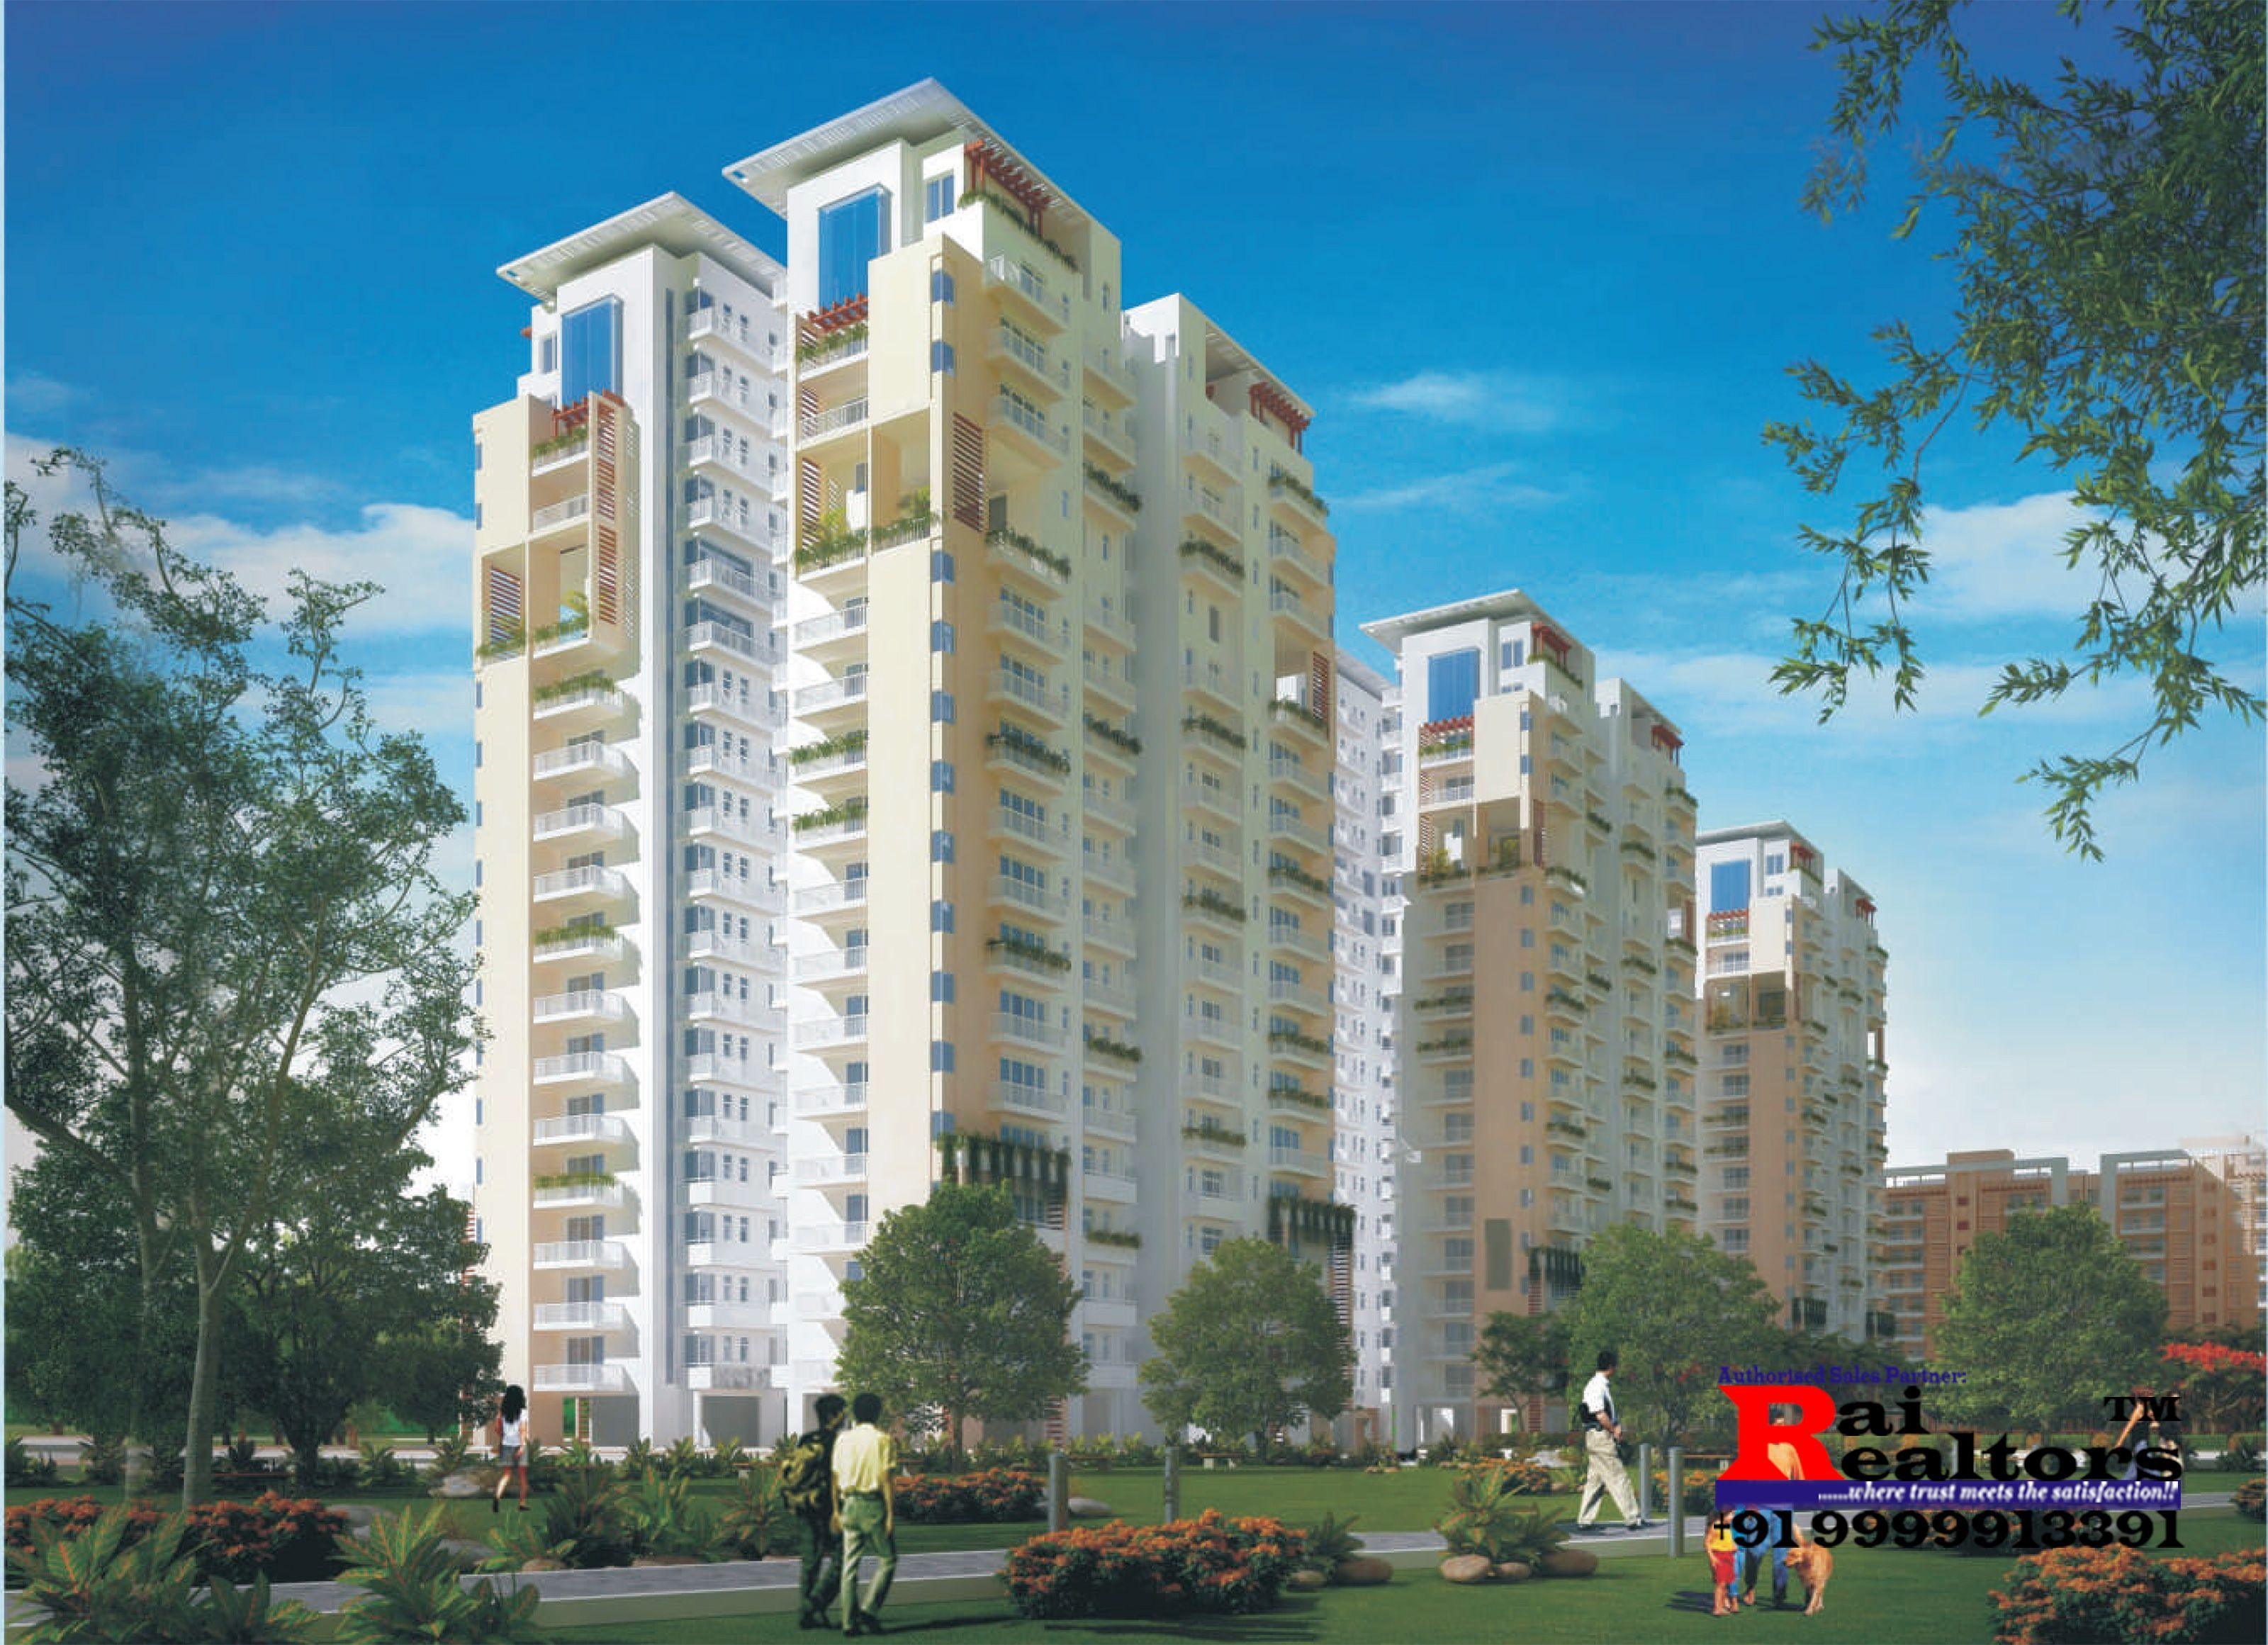 Indiabulls Gulmohar Avenue in Gurgaon, Haryāna Home